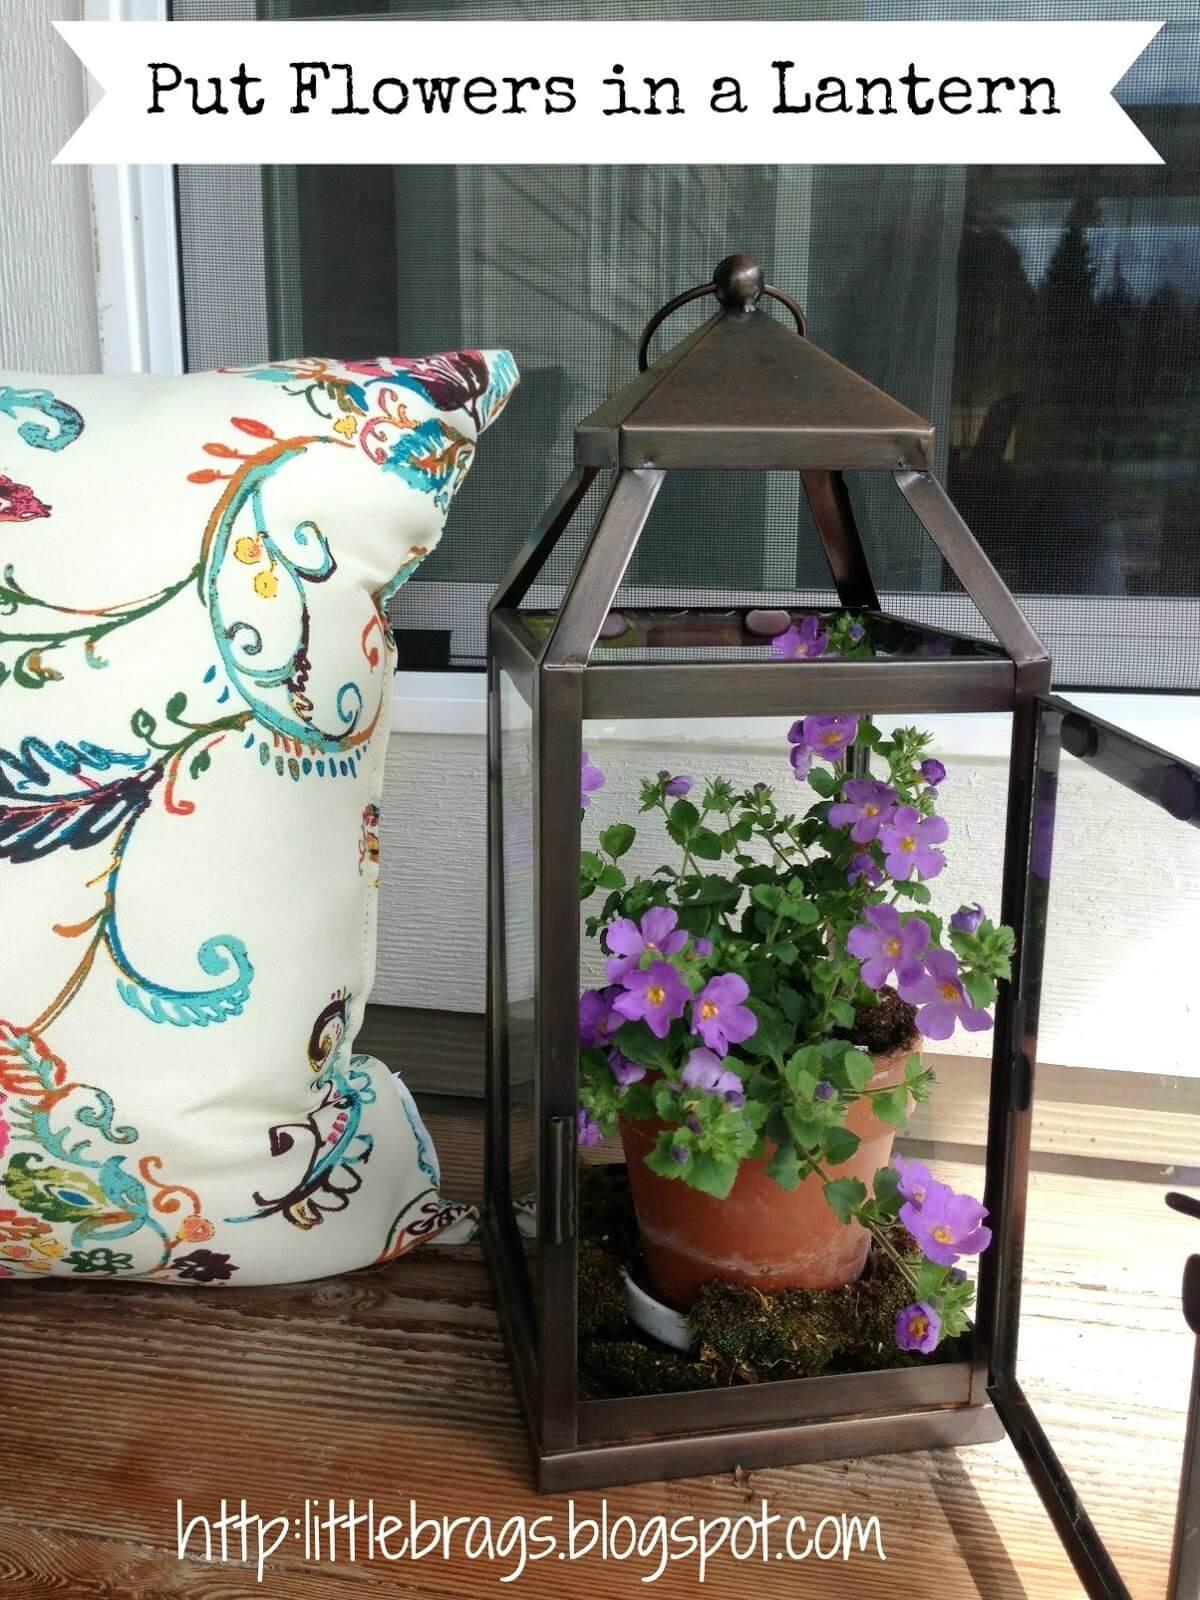 My Special Little Flowerpot Lantern